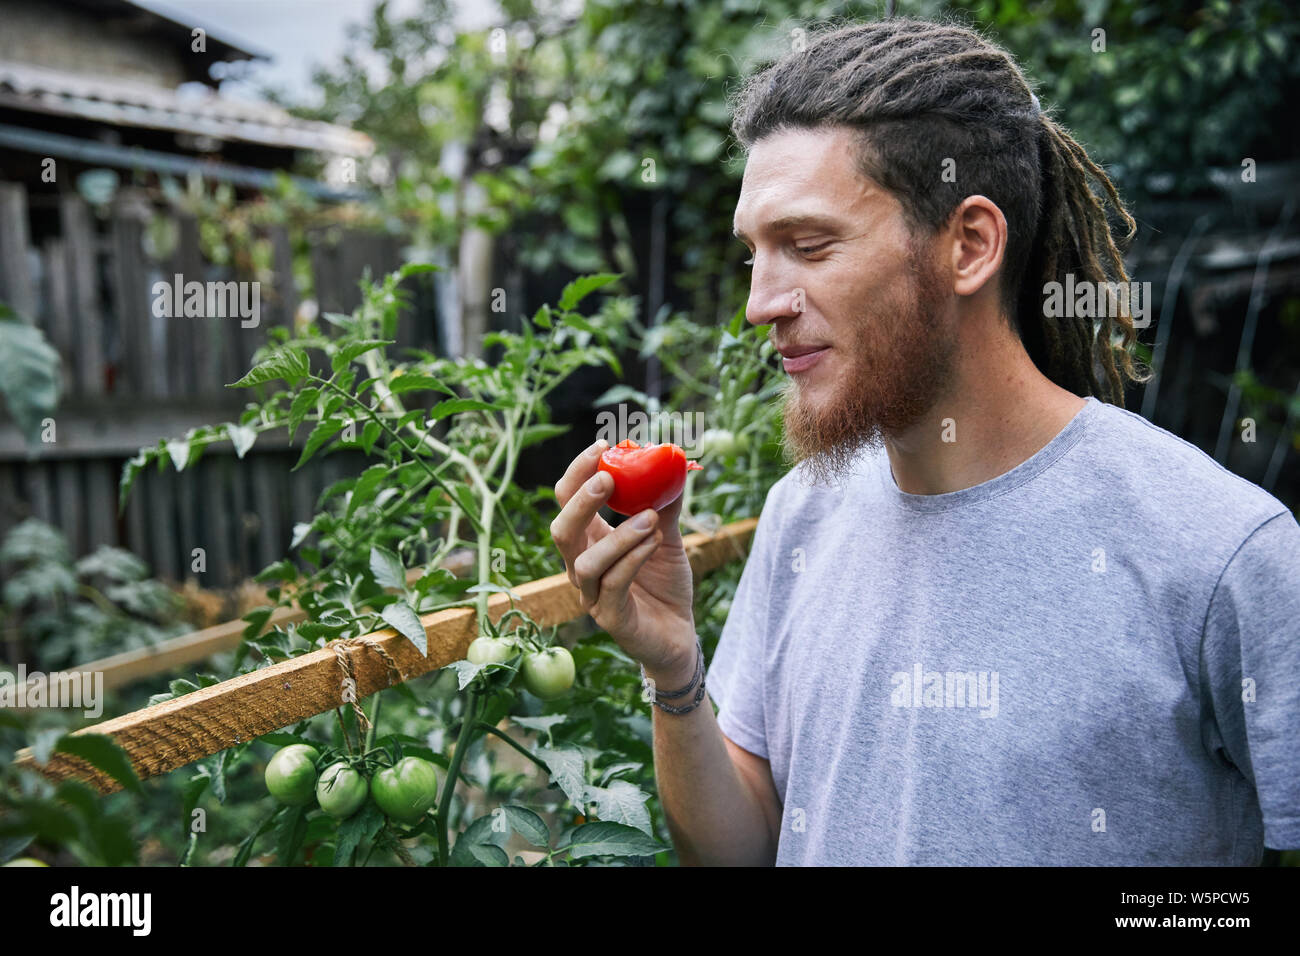 Agricultor barbudo con dreadlocks comer tomate fresco de su invernadero Foto de stock